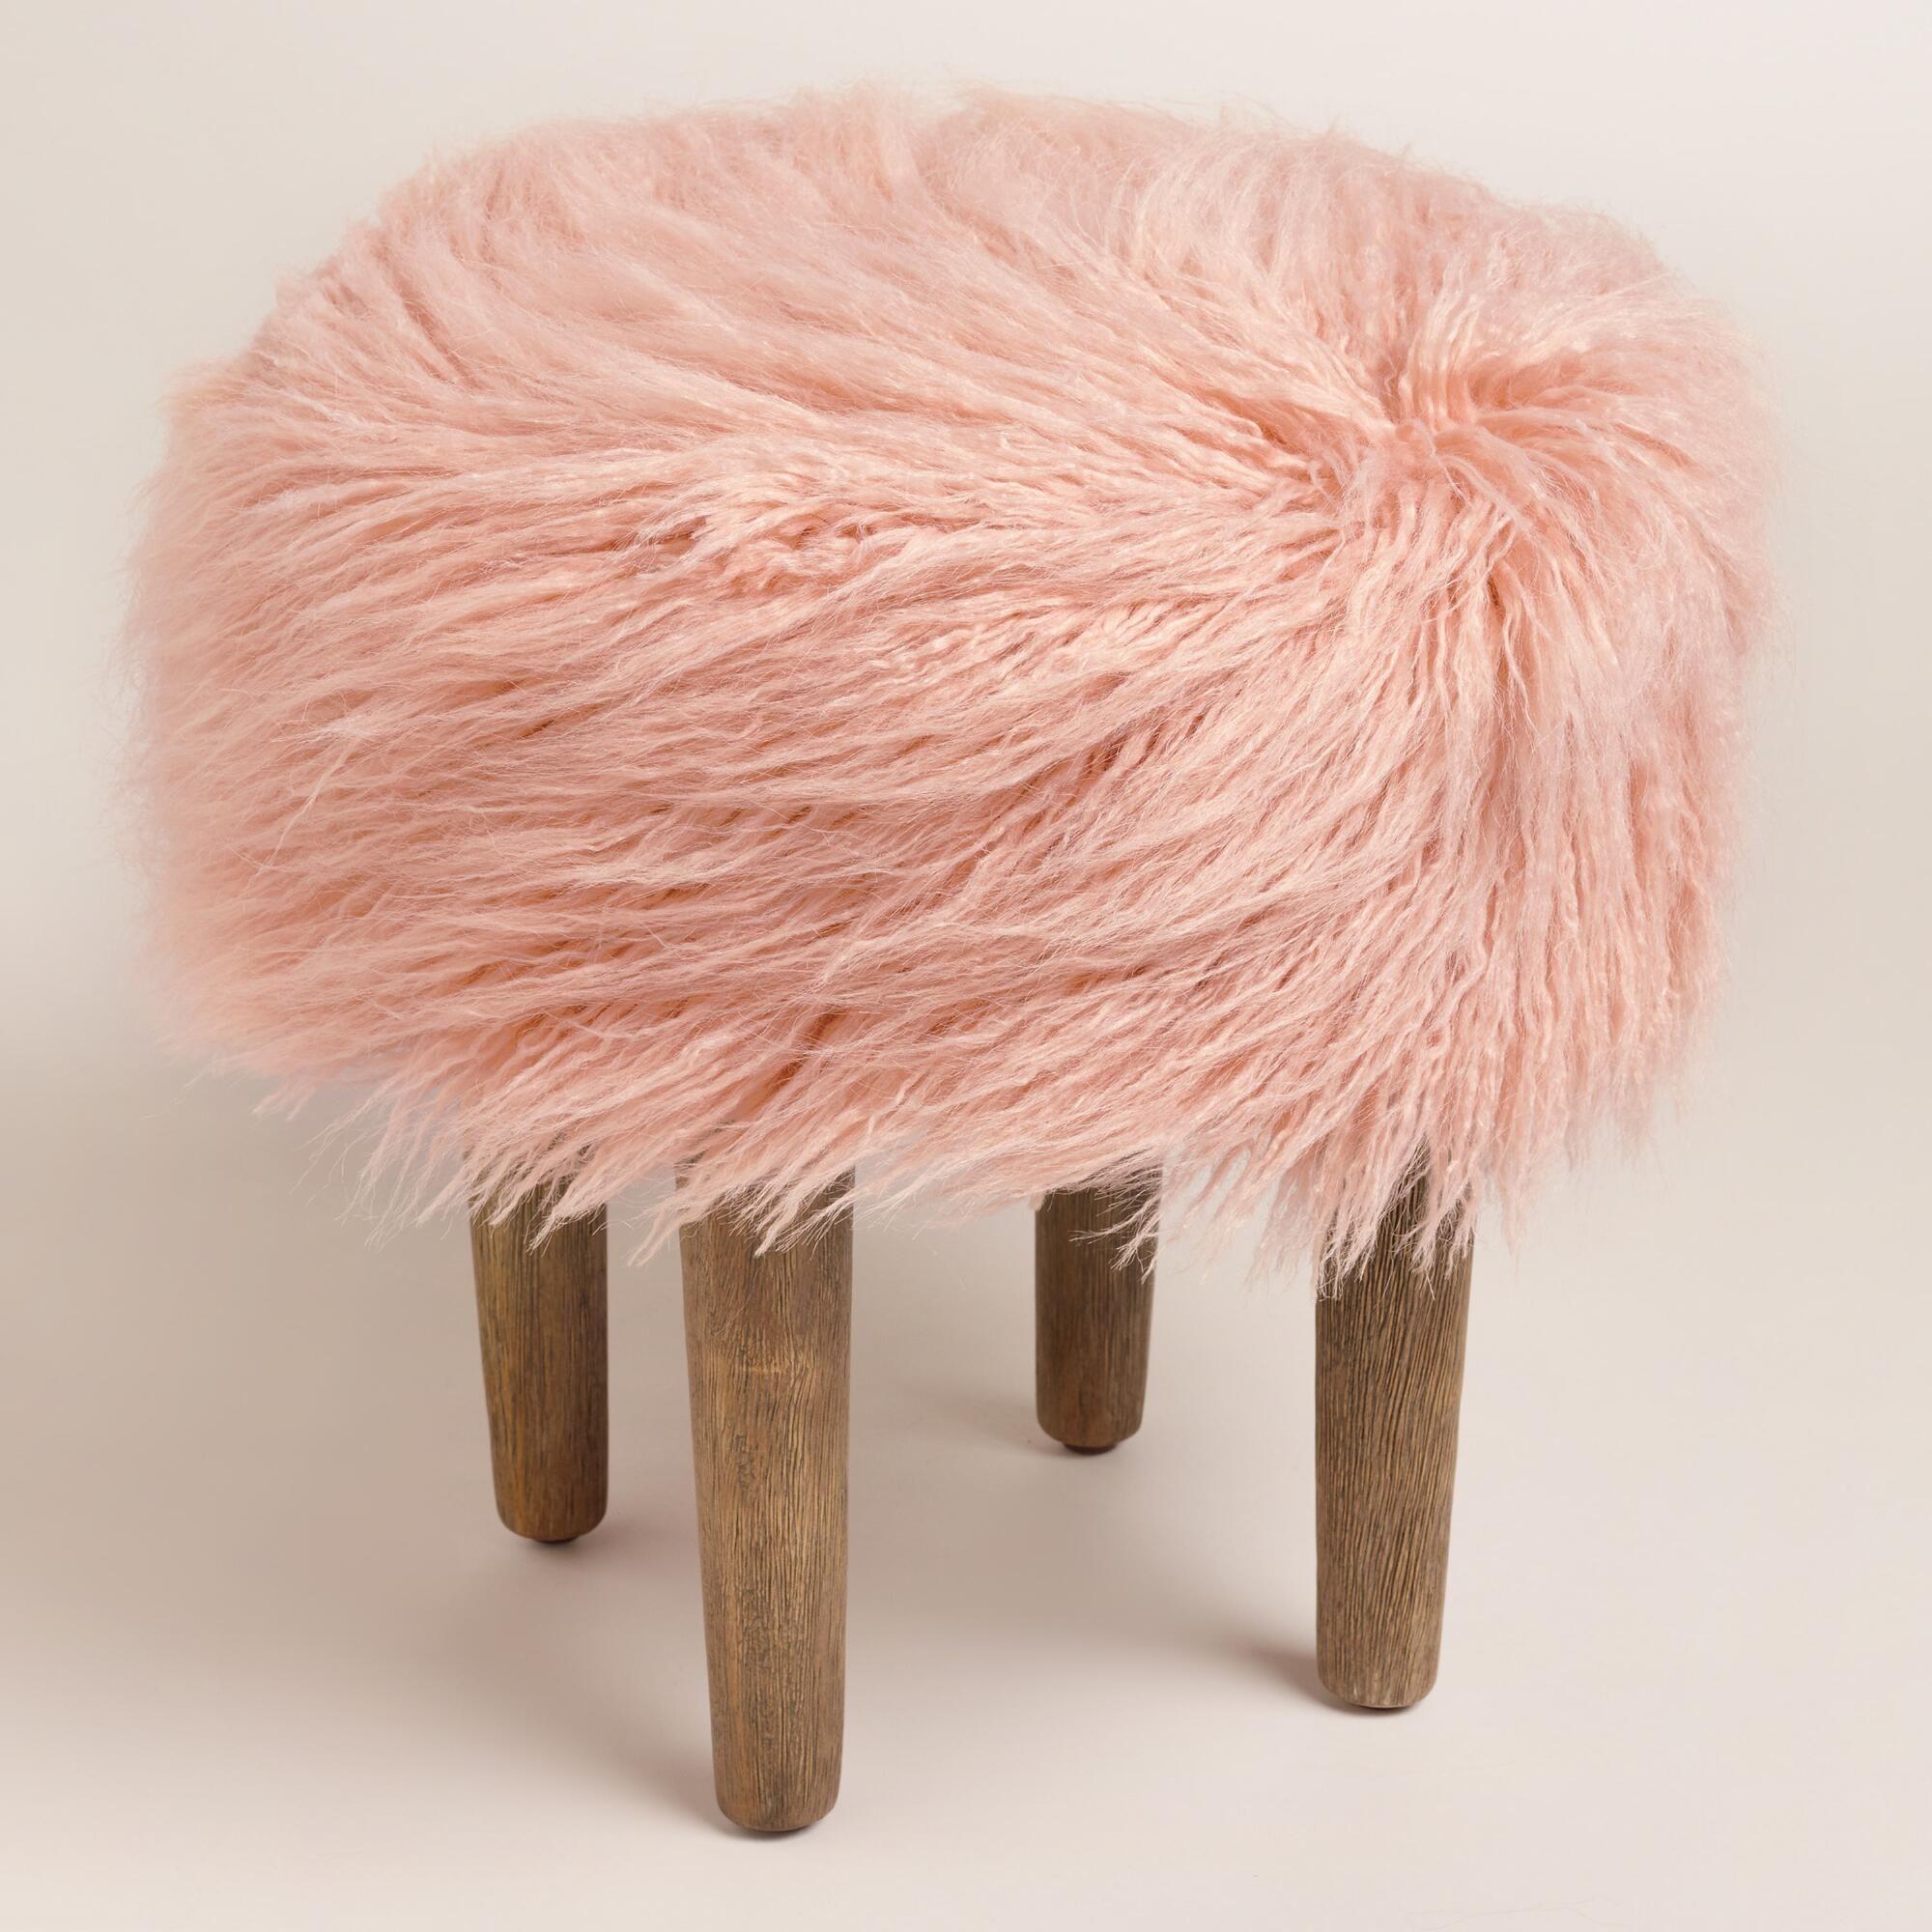 Blush Flokati Stool Faux Fur Rug Pink Office Chair Stool